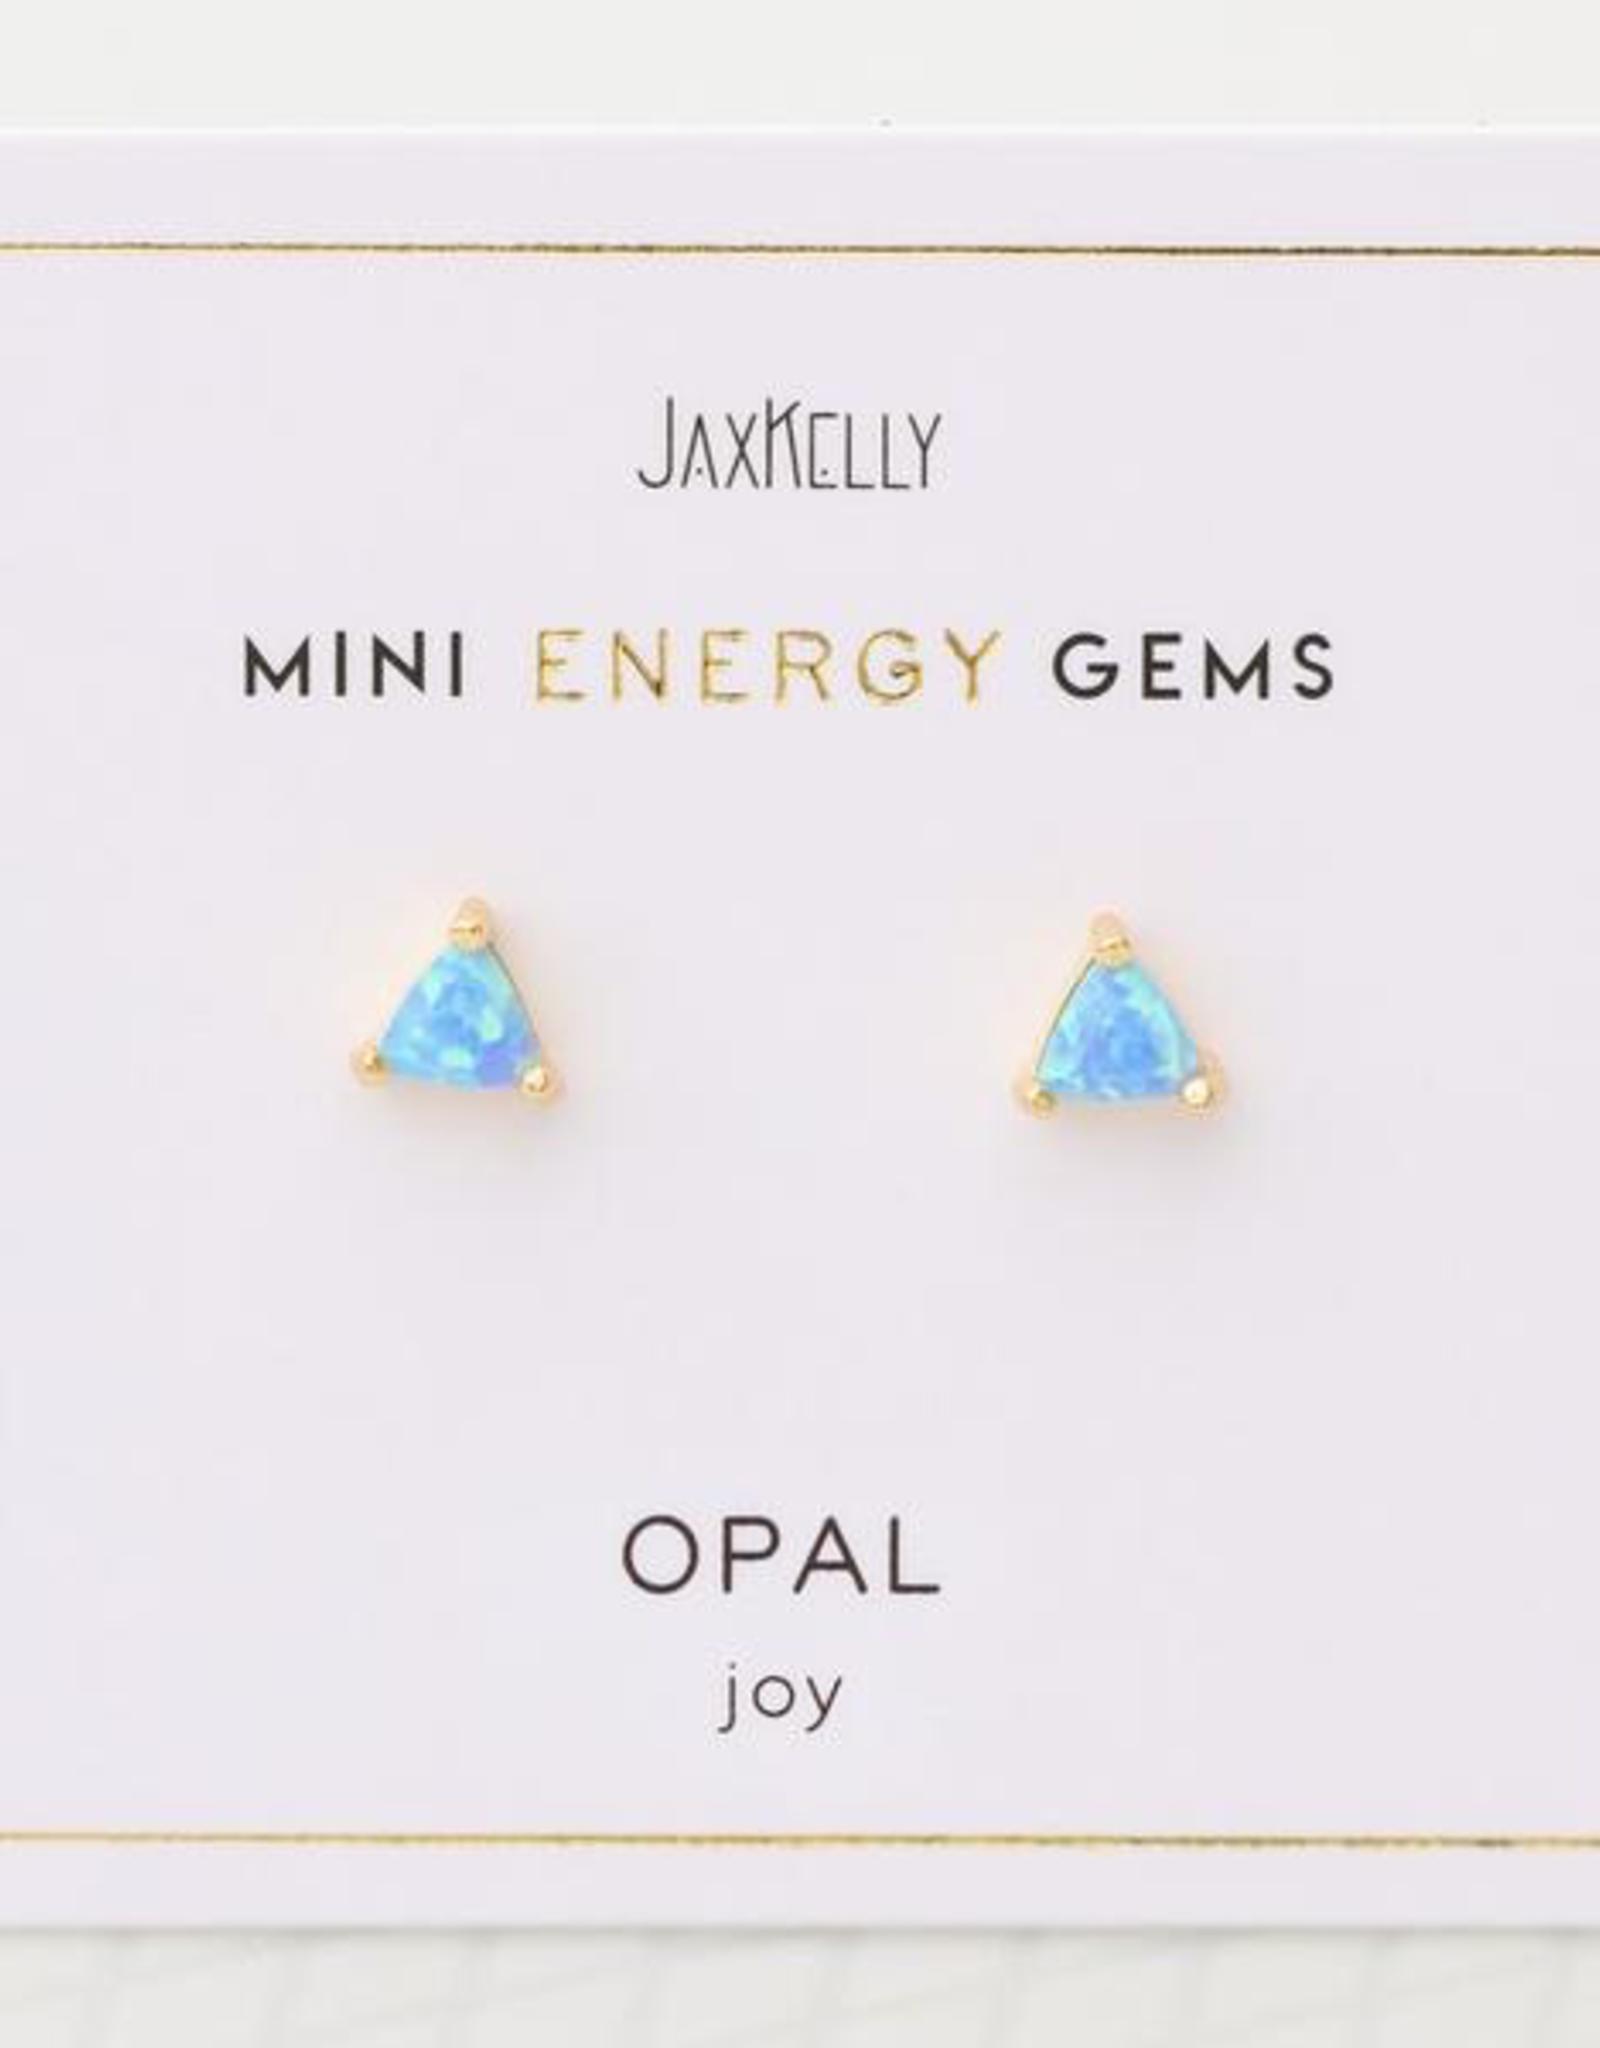 Earrings, Mini Energy Gem, Opal, Sterling Silver Base with18k Gold Plating